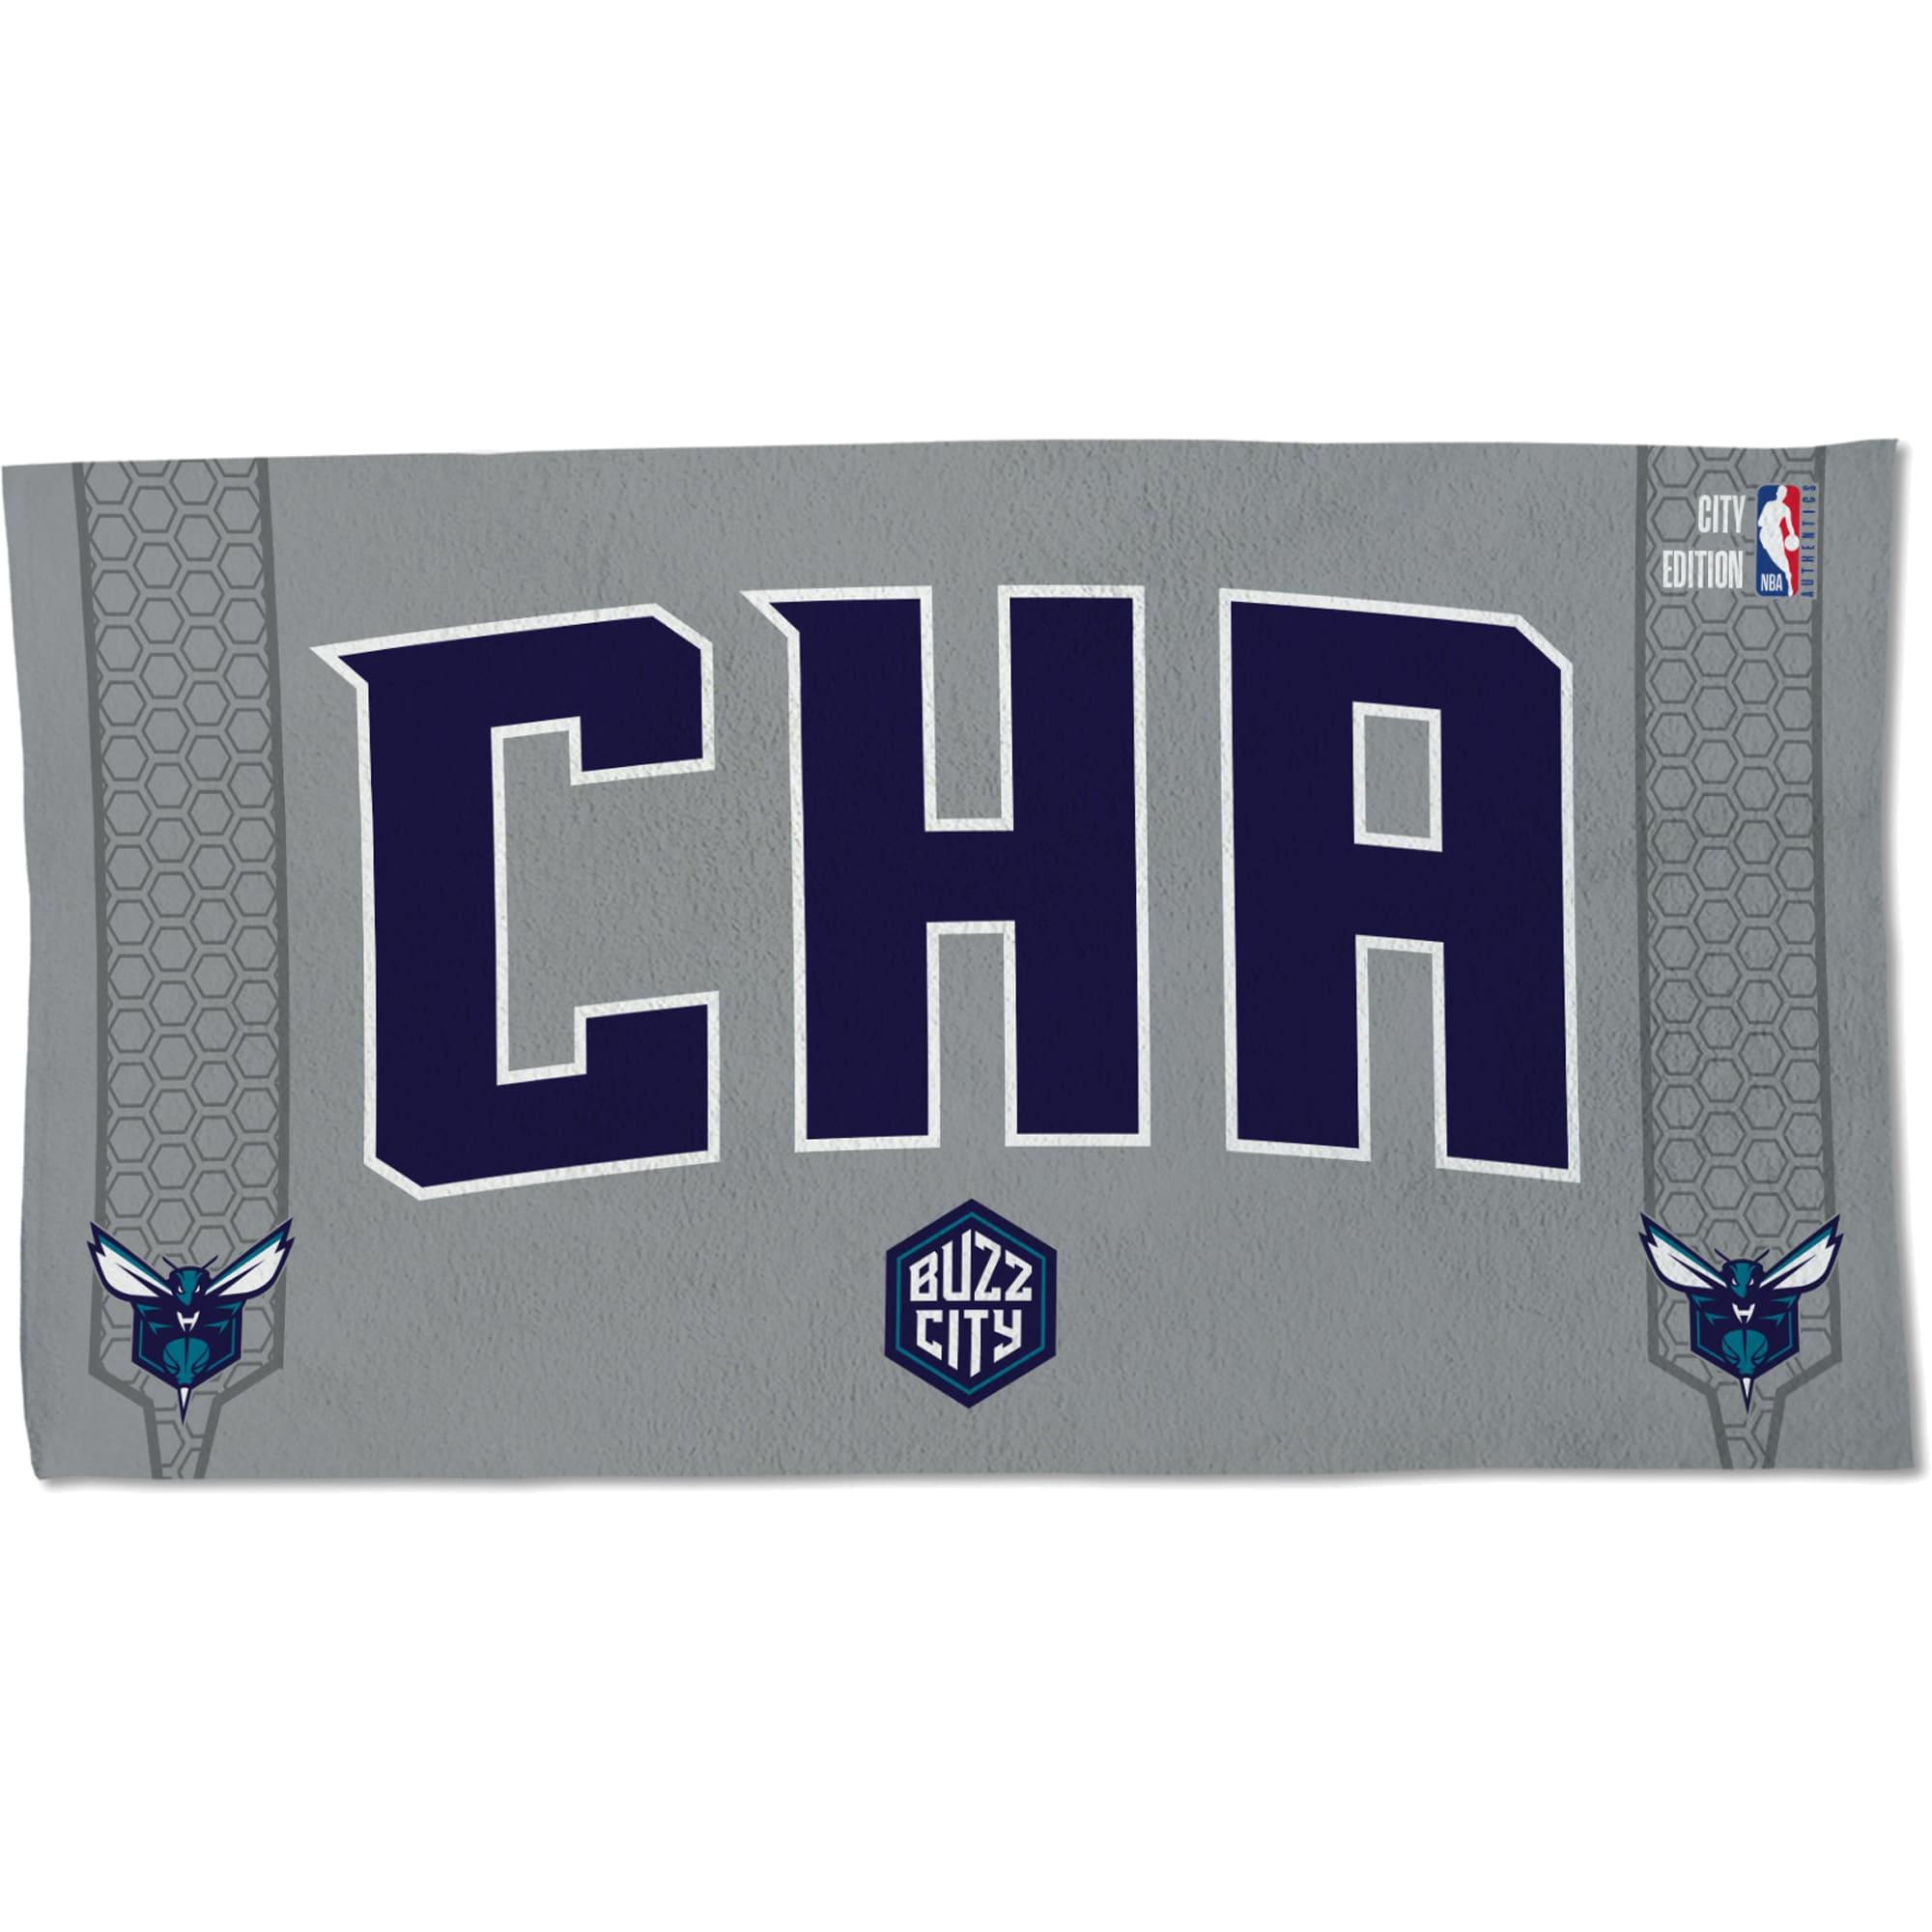 Charlotte Hornets WinCraft 2019/20 City Edition 22'' x 42'' Official Locker Room Towel